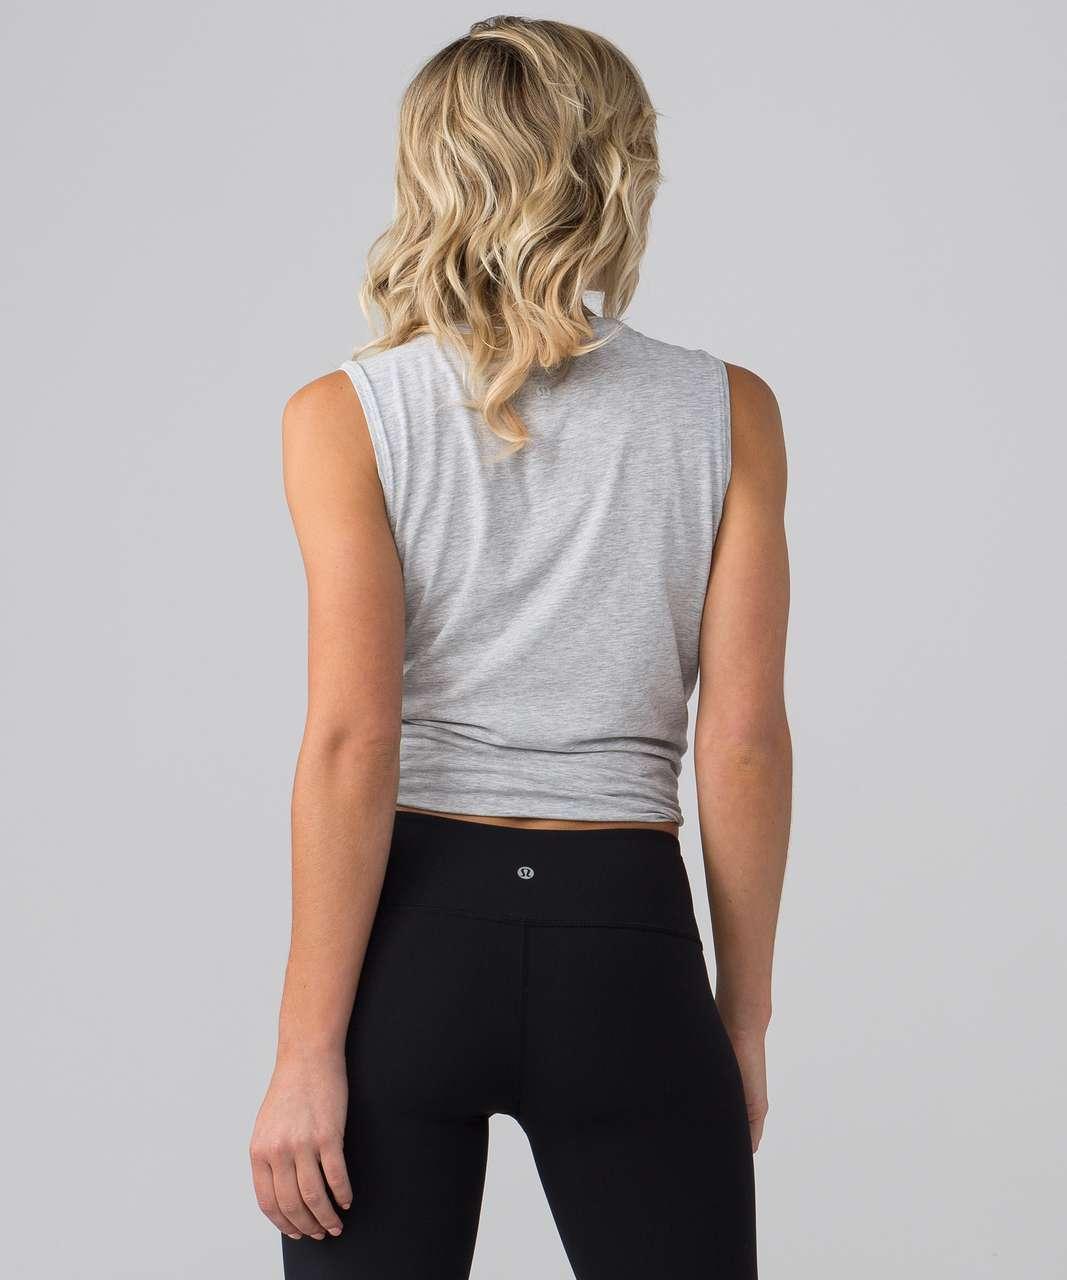 Lululemon Love Sleeveless Tank (This Is Yoga) - Heathered Vapor